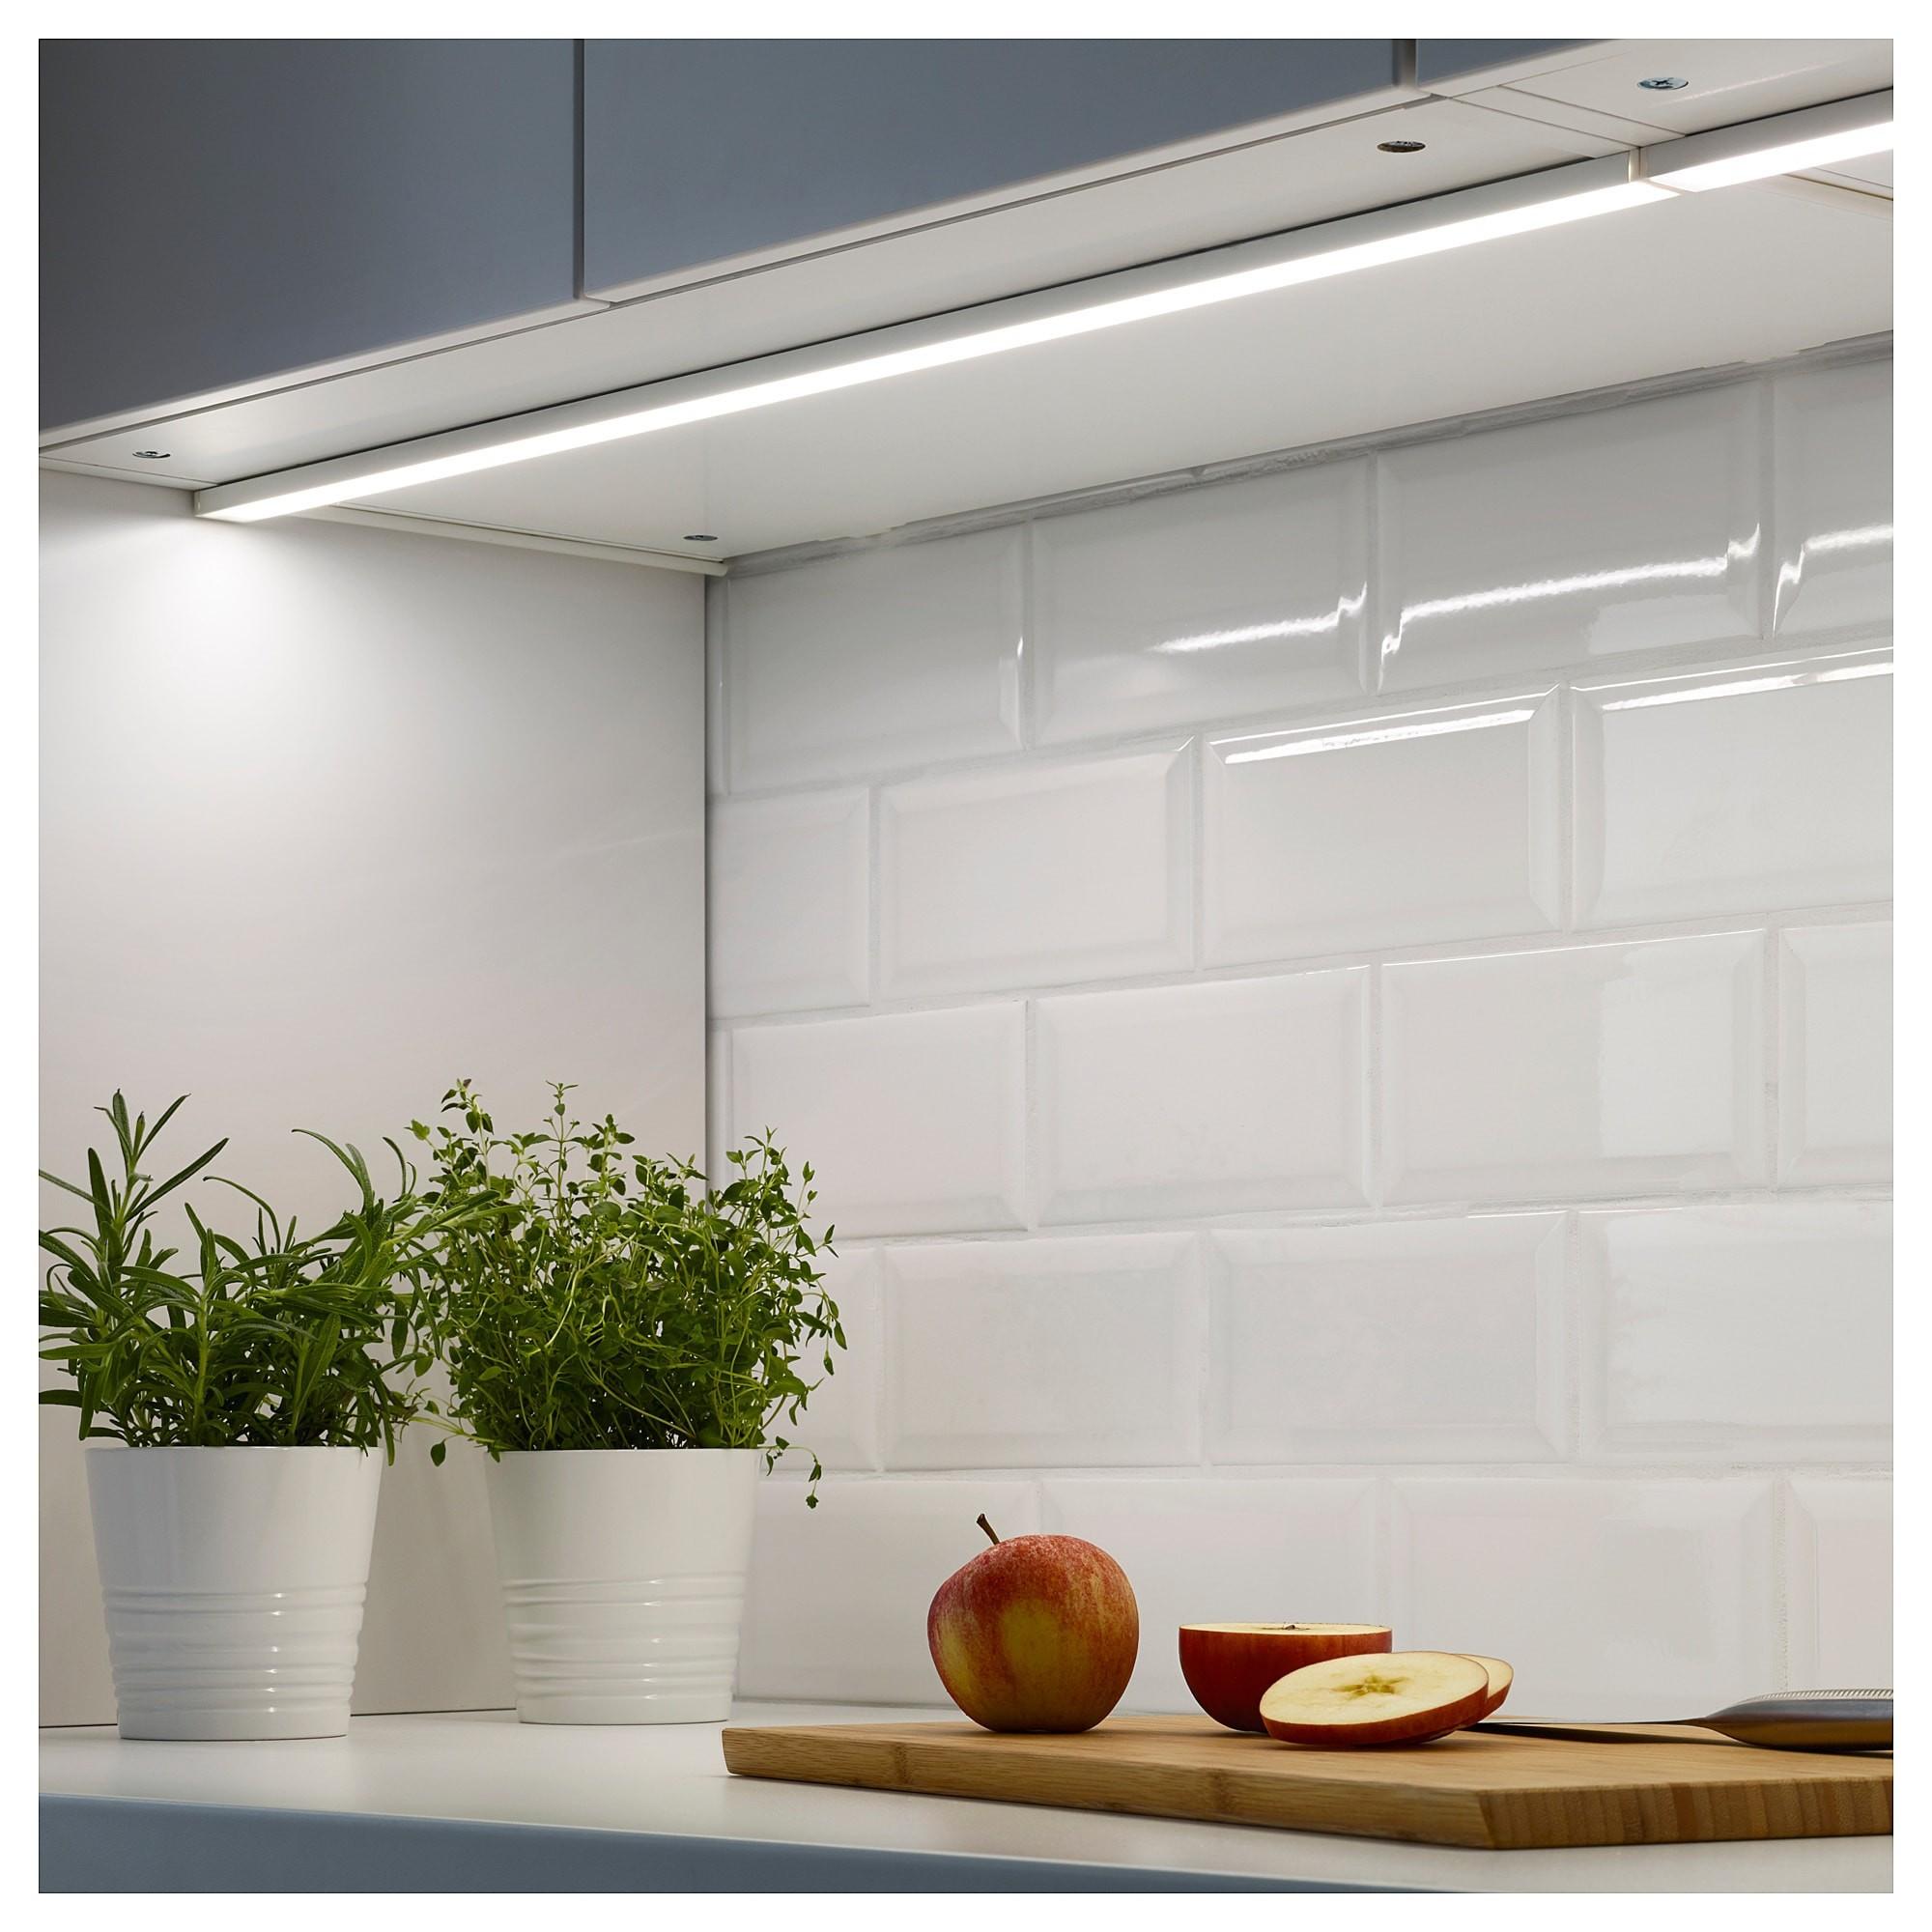 iluminacion cocina led con motivo de gustado omlopp iluminacic2b3n encimera led 60 cm ikea plan para iluminacion cocina led